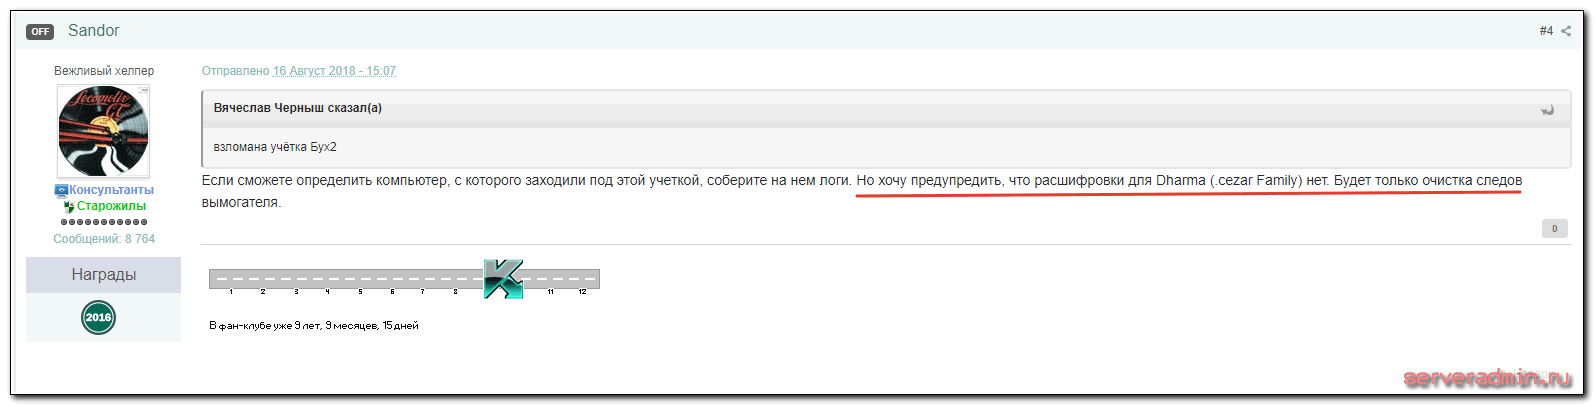 Расшифровка невозможна